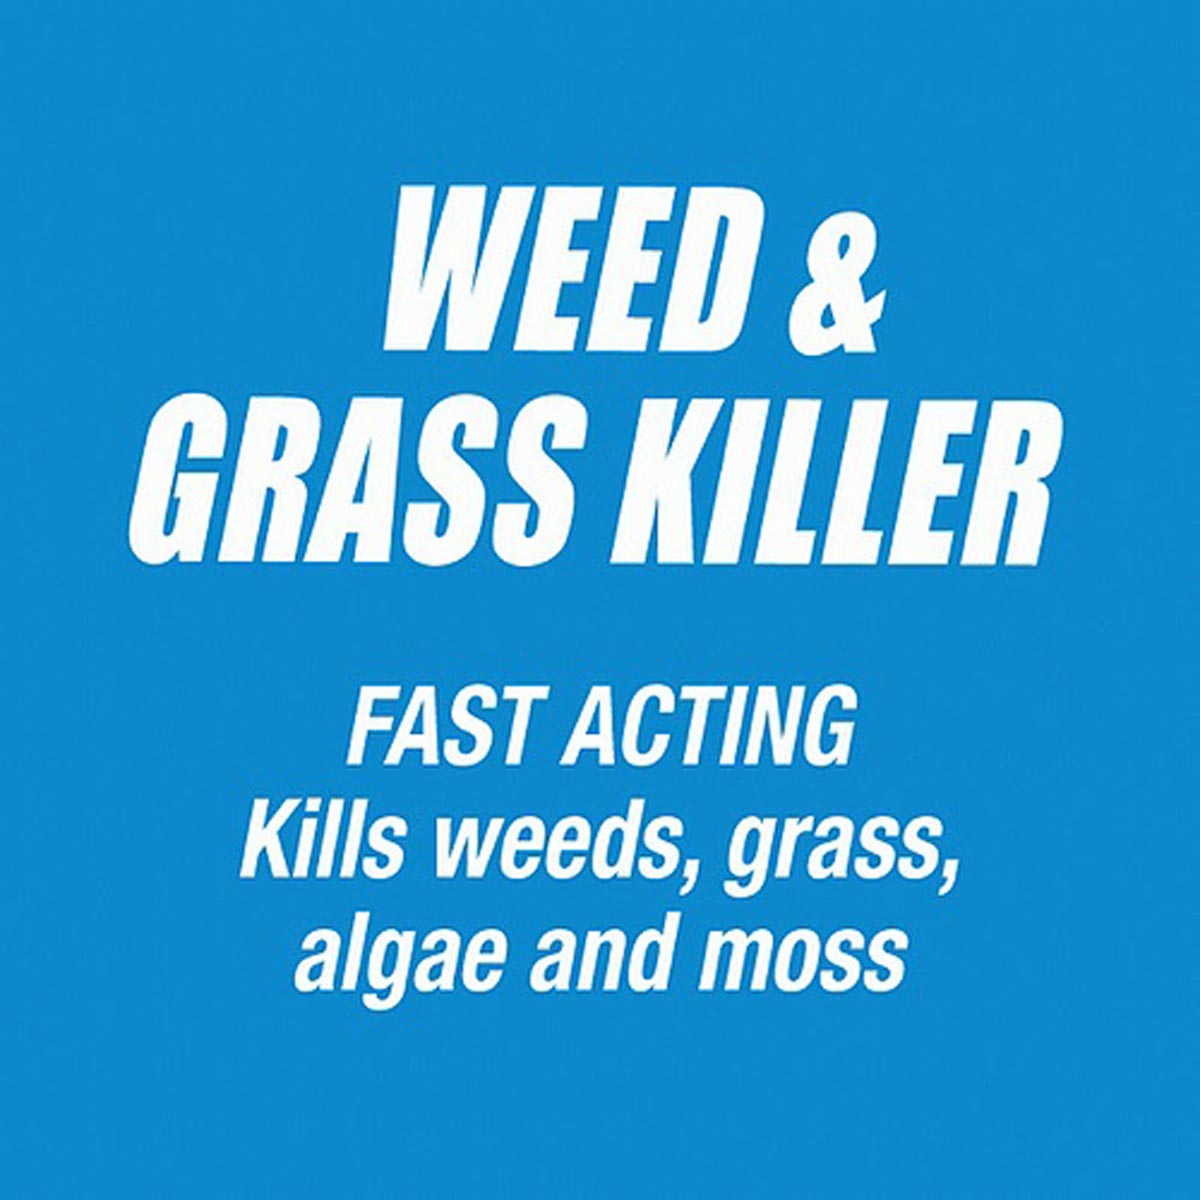 Pulverize Weed & Grass Killer, 32 oz. Ready-to-Use Spray